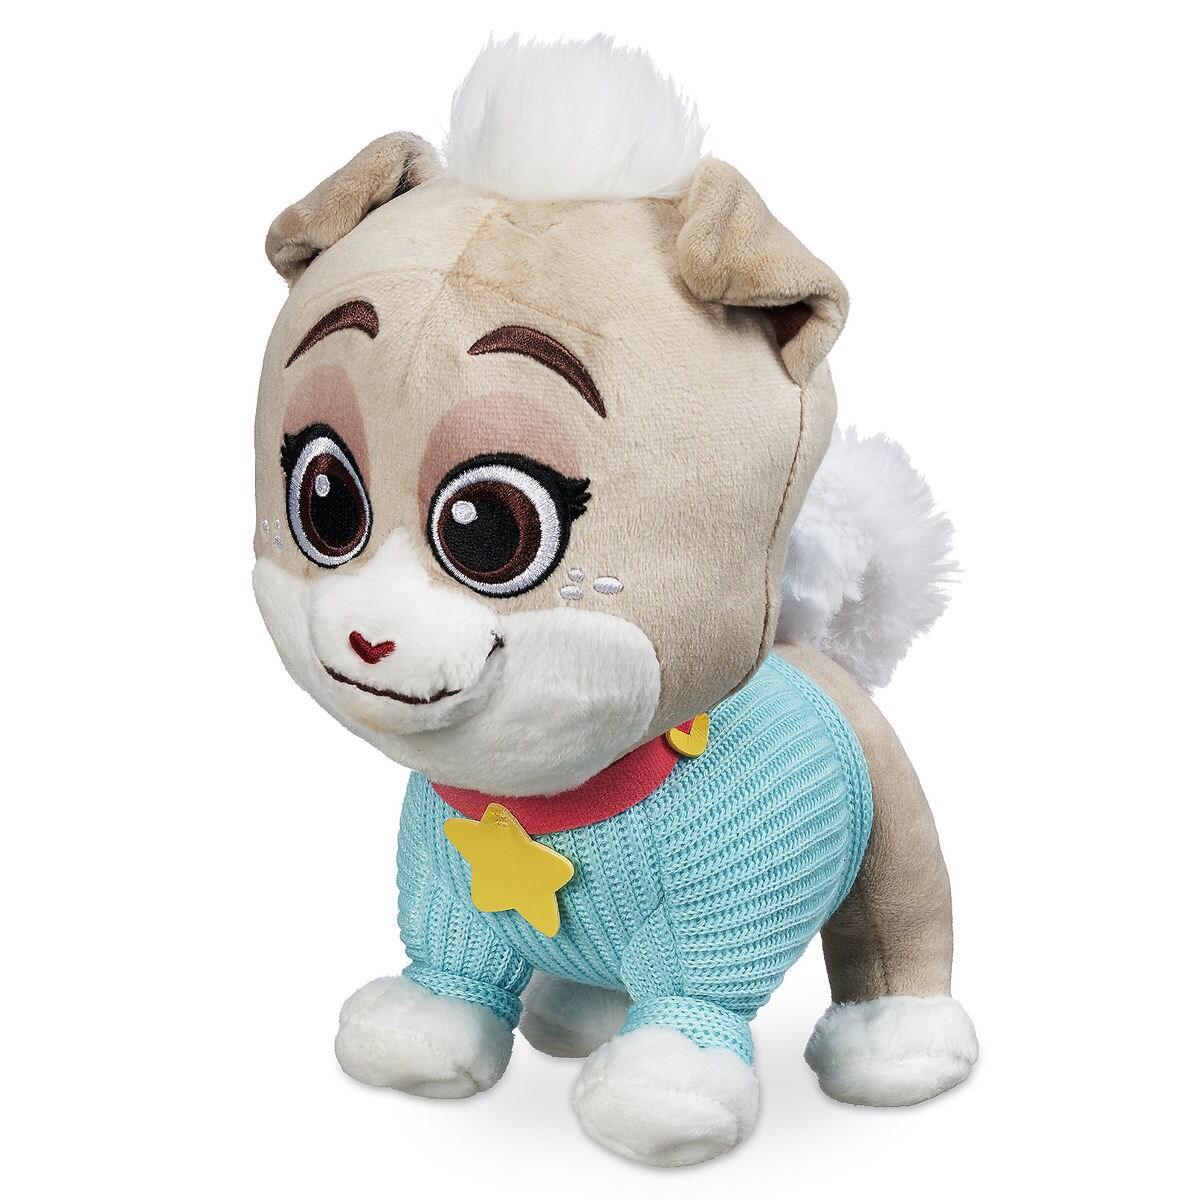 Keia Plush Puppy Dog Pals Small Shopdisney